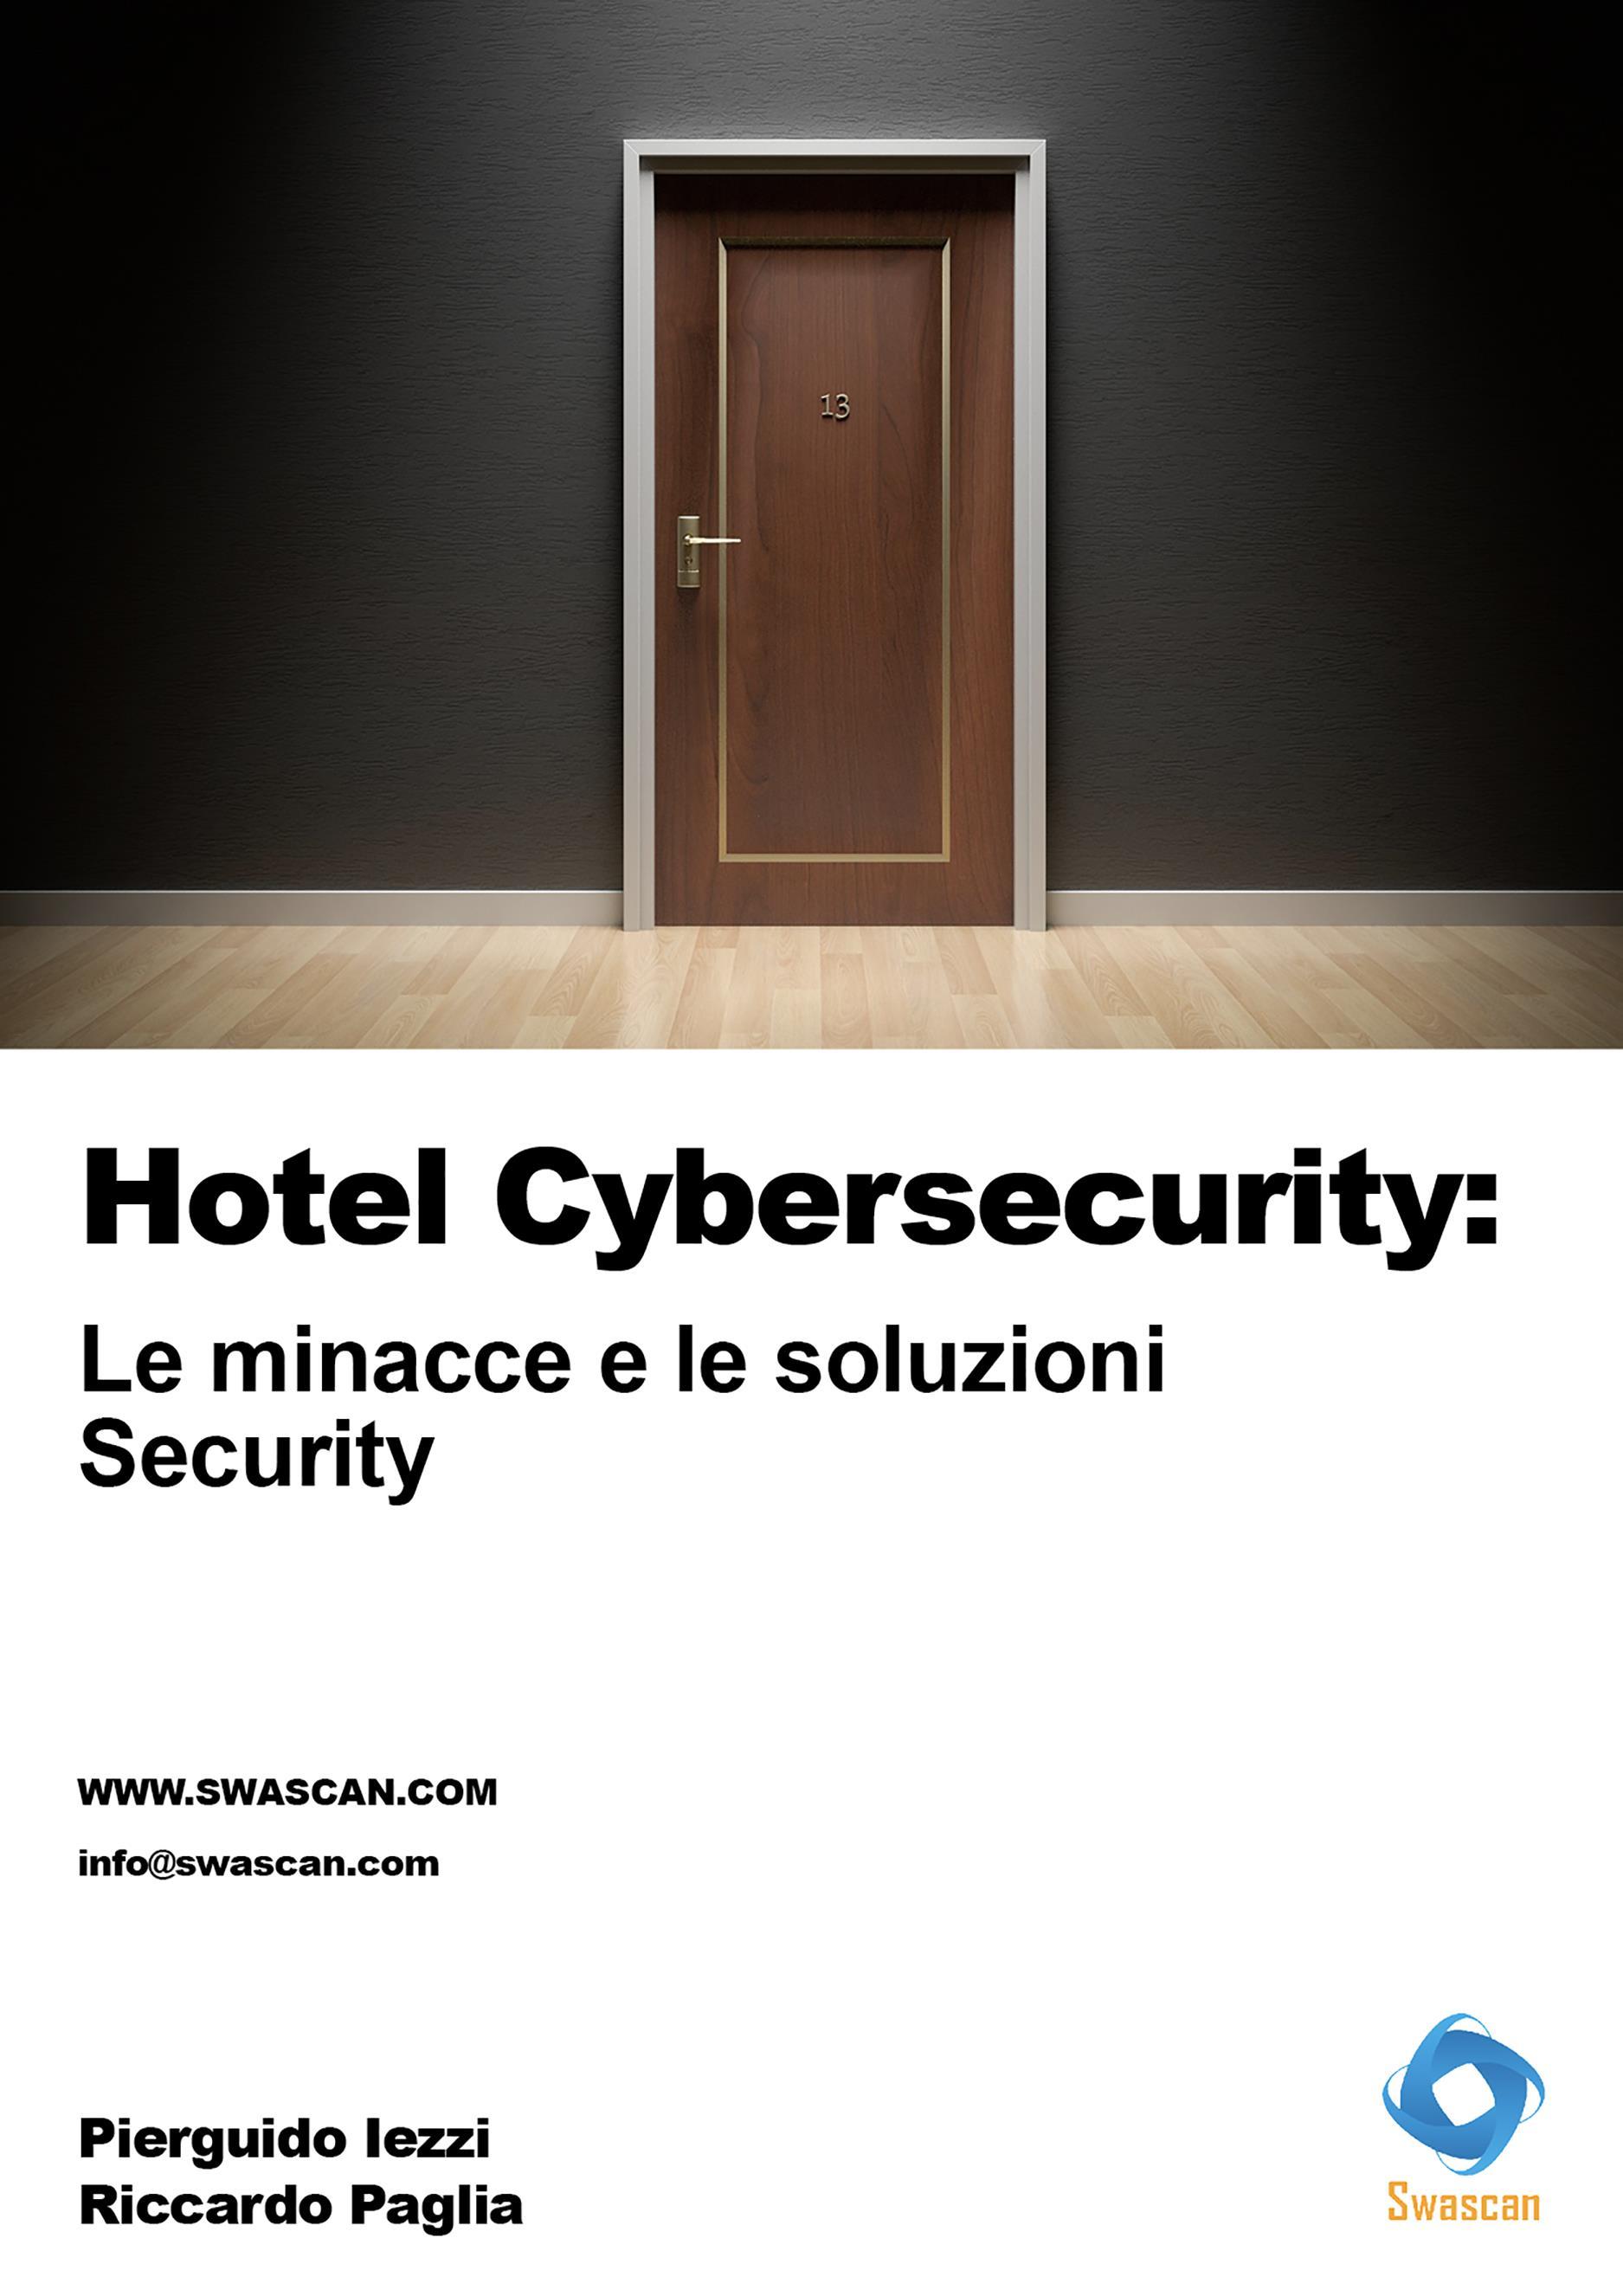 Hotel Cybersecurity: le minacce e le soluzioni. Security